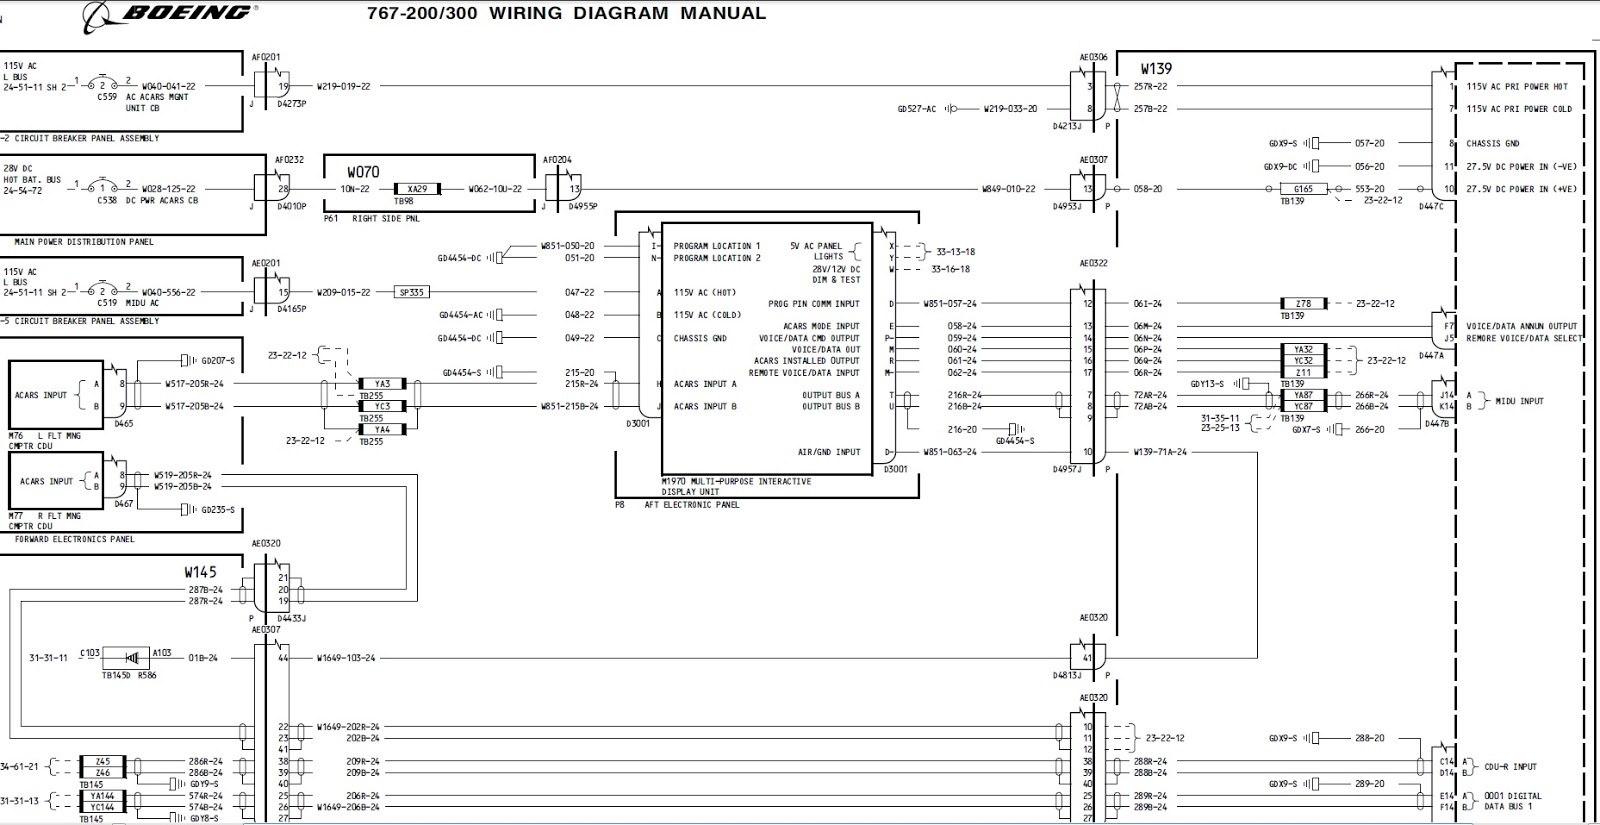 medium resolution of boeing wiring diagram wiring diagram forward boeing wiring diagram manual boeing wiring diagrams